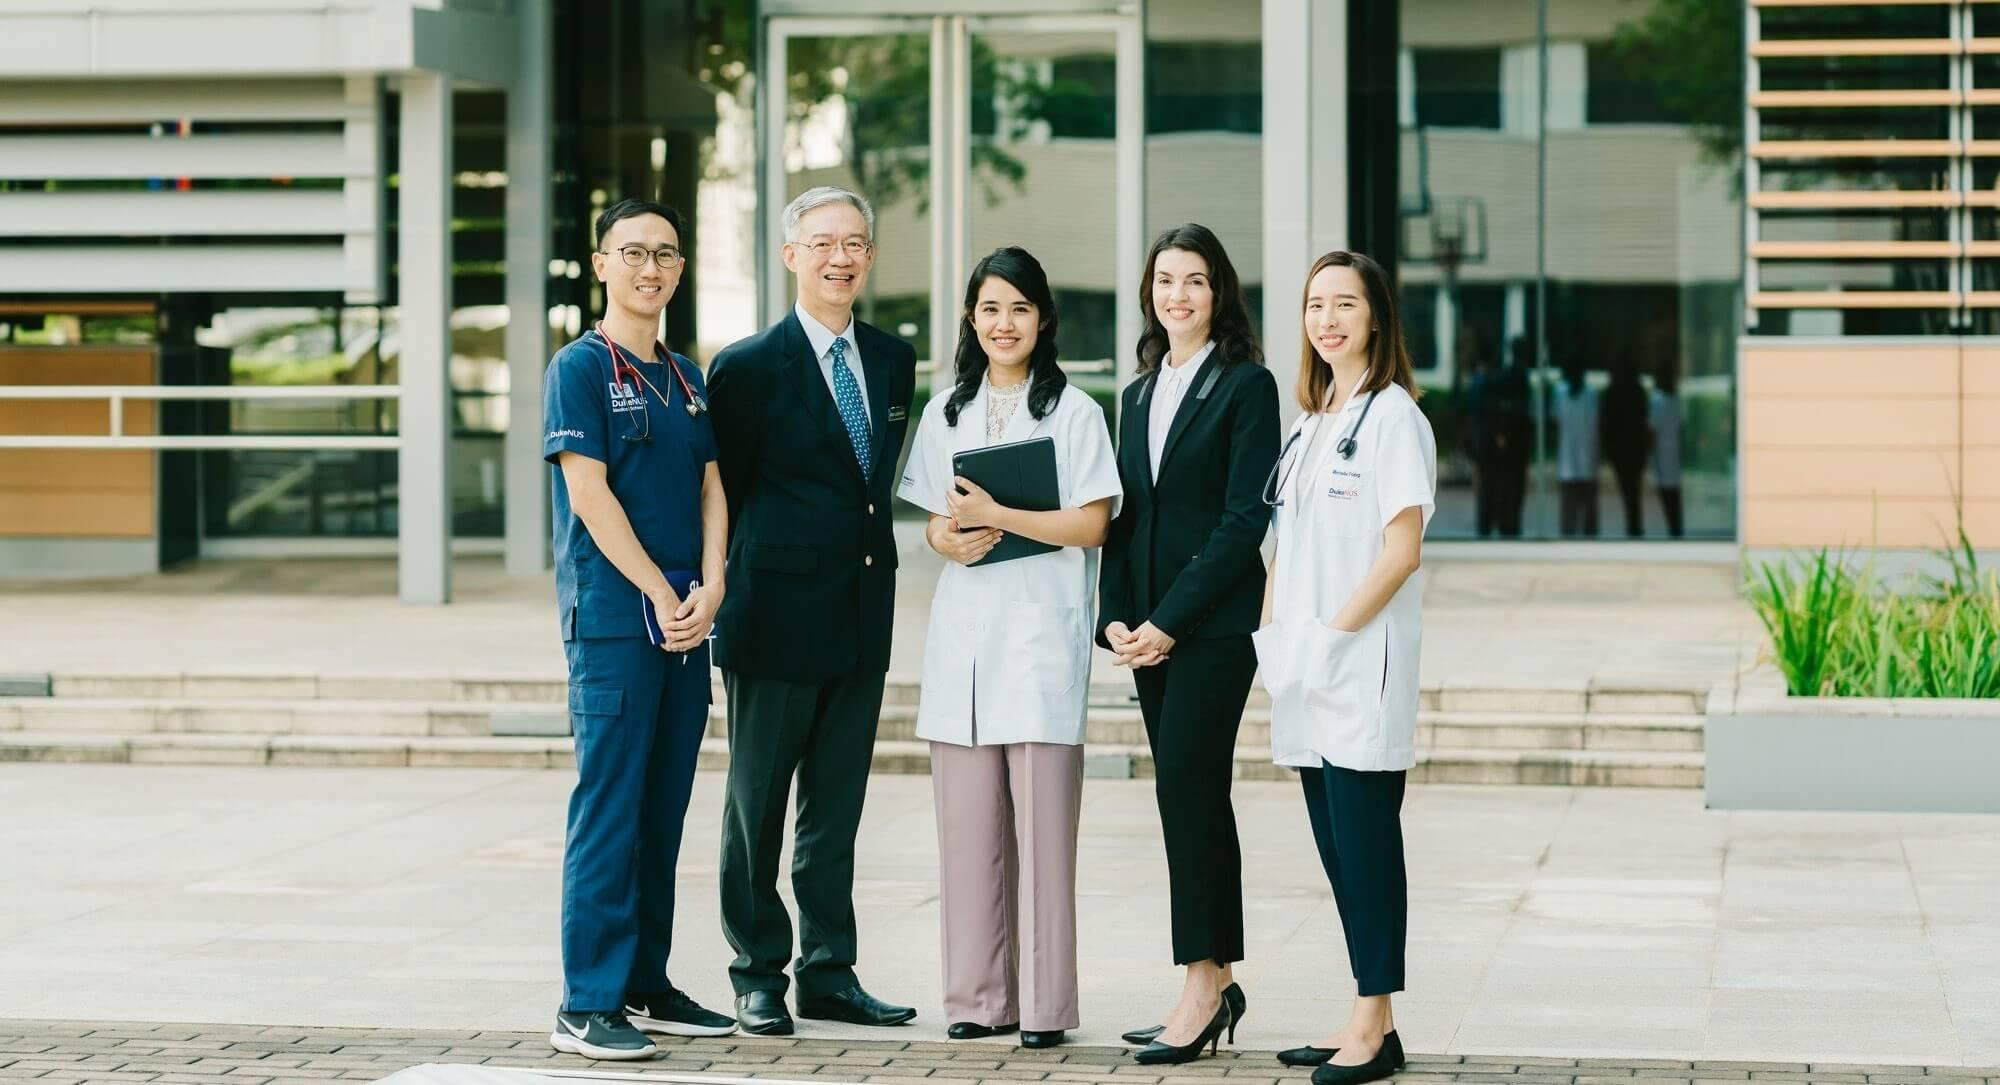 Duke-NUS Medical School: Generous scholarships for tomorrow's changemakers